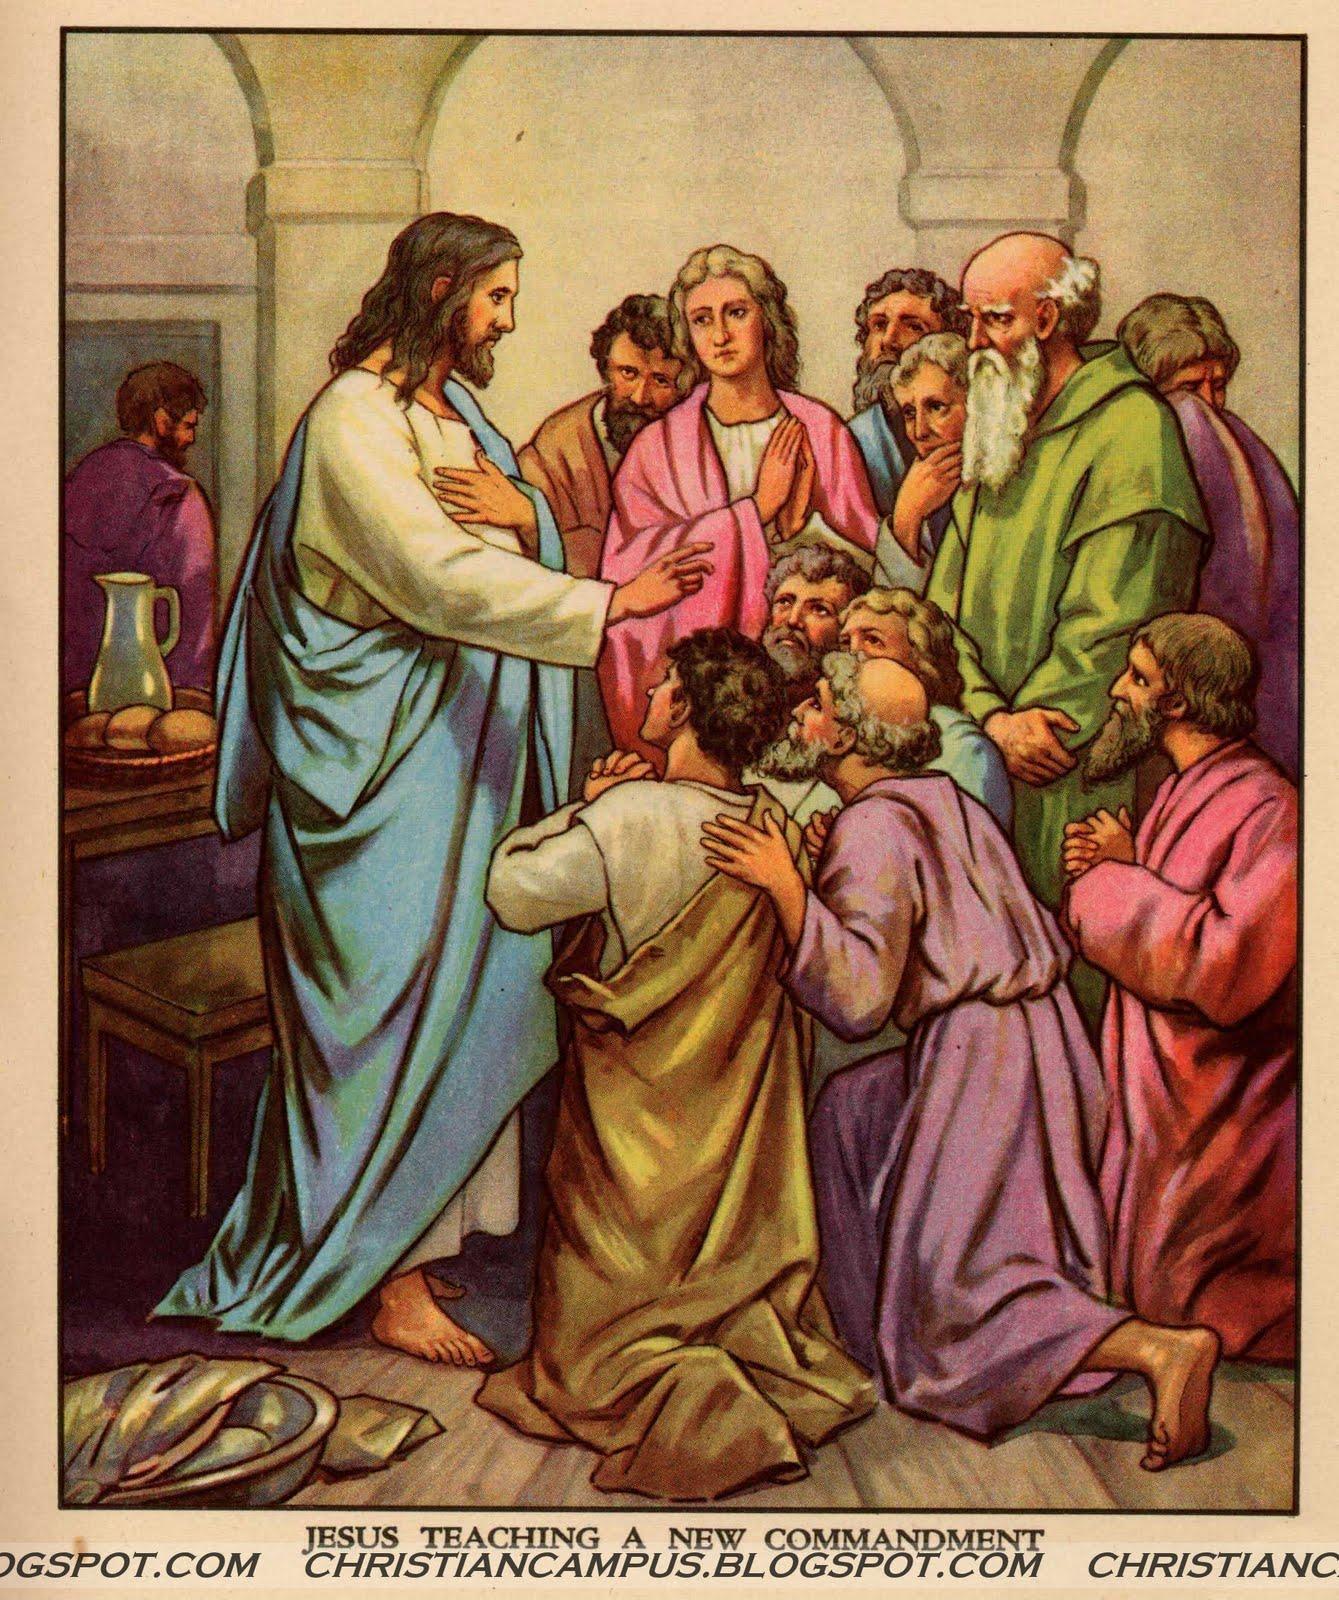 http://3.bp.blogspot.com/_s88scOGAg14/SwFSFszd43I/AAAAAAAADNM/qjWIAfh1YBQ/s1600/jesus-teaching-a-new-commandment.jpg